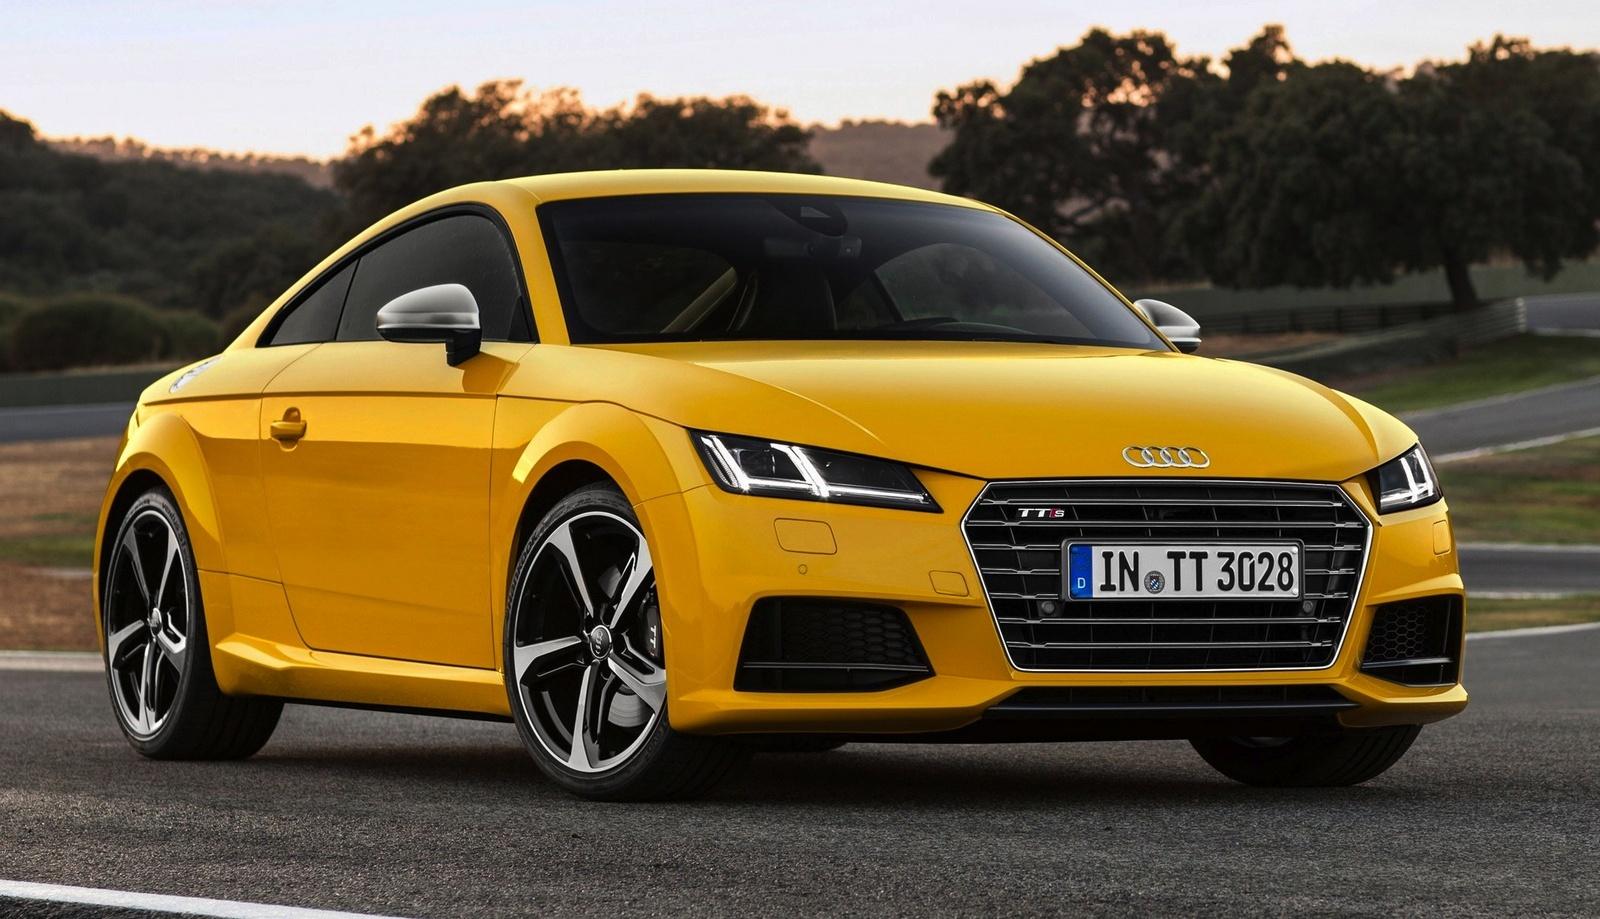 Audi TTS Overview CarGurus - Audi tts for sale